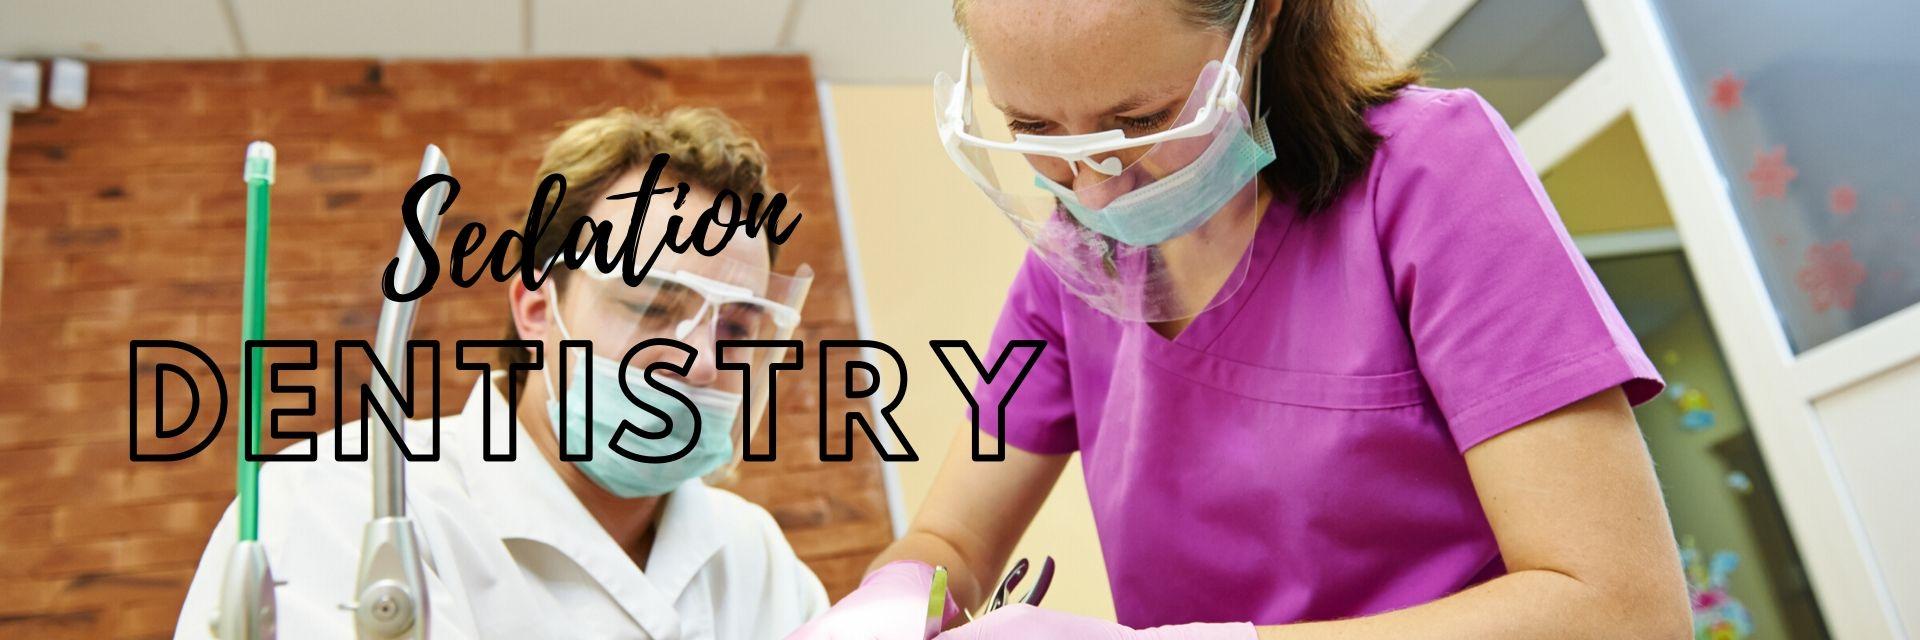 Sedation Dentistry Wellington Point